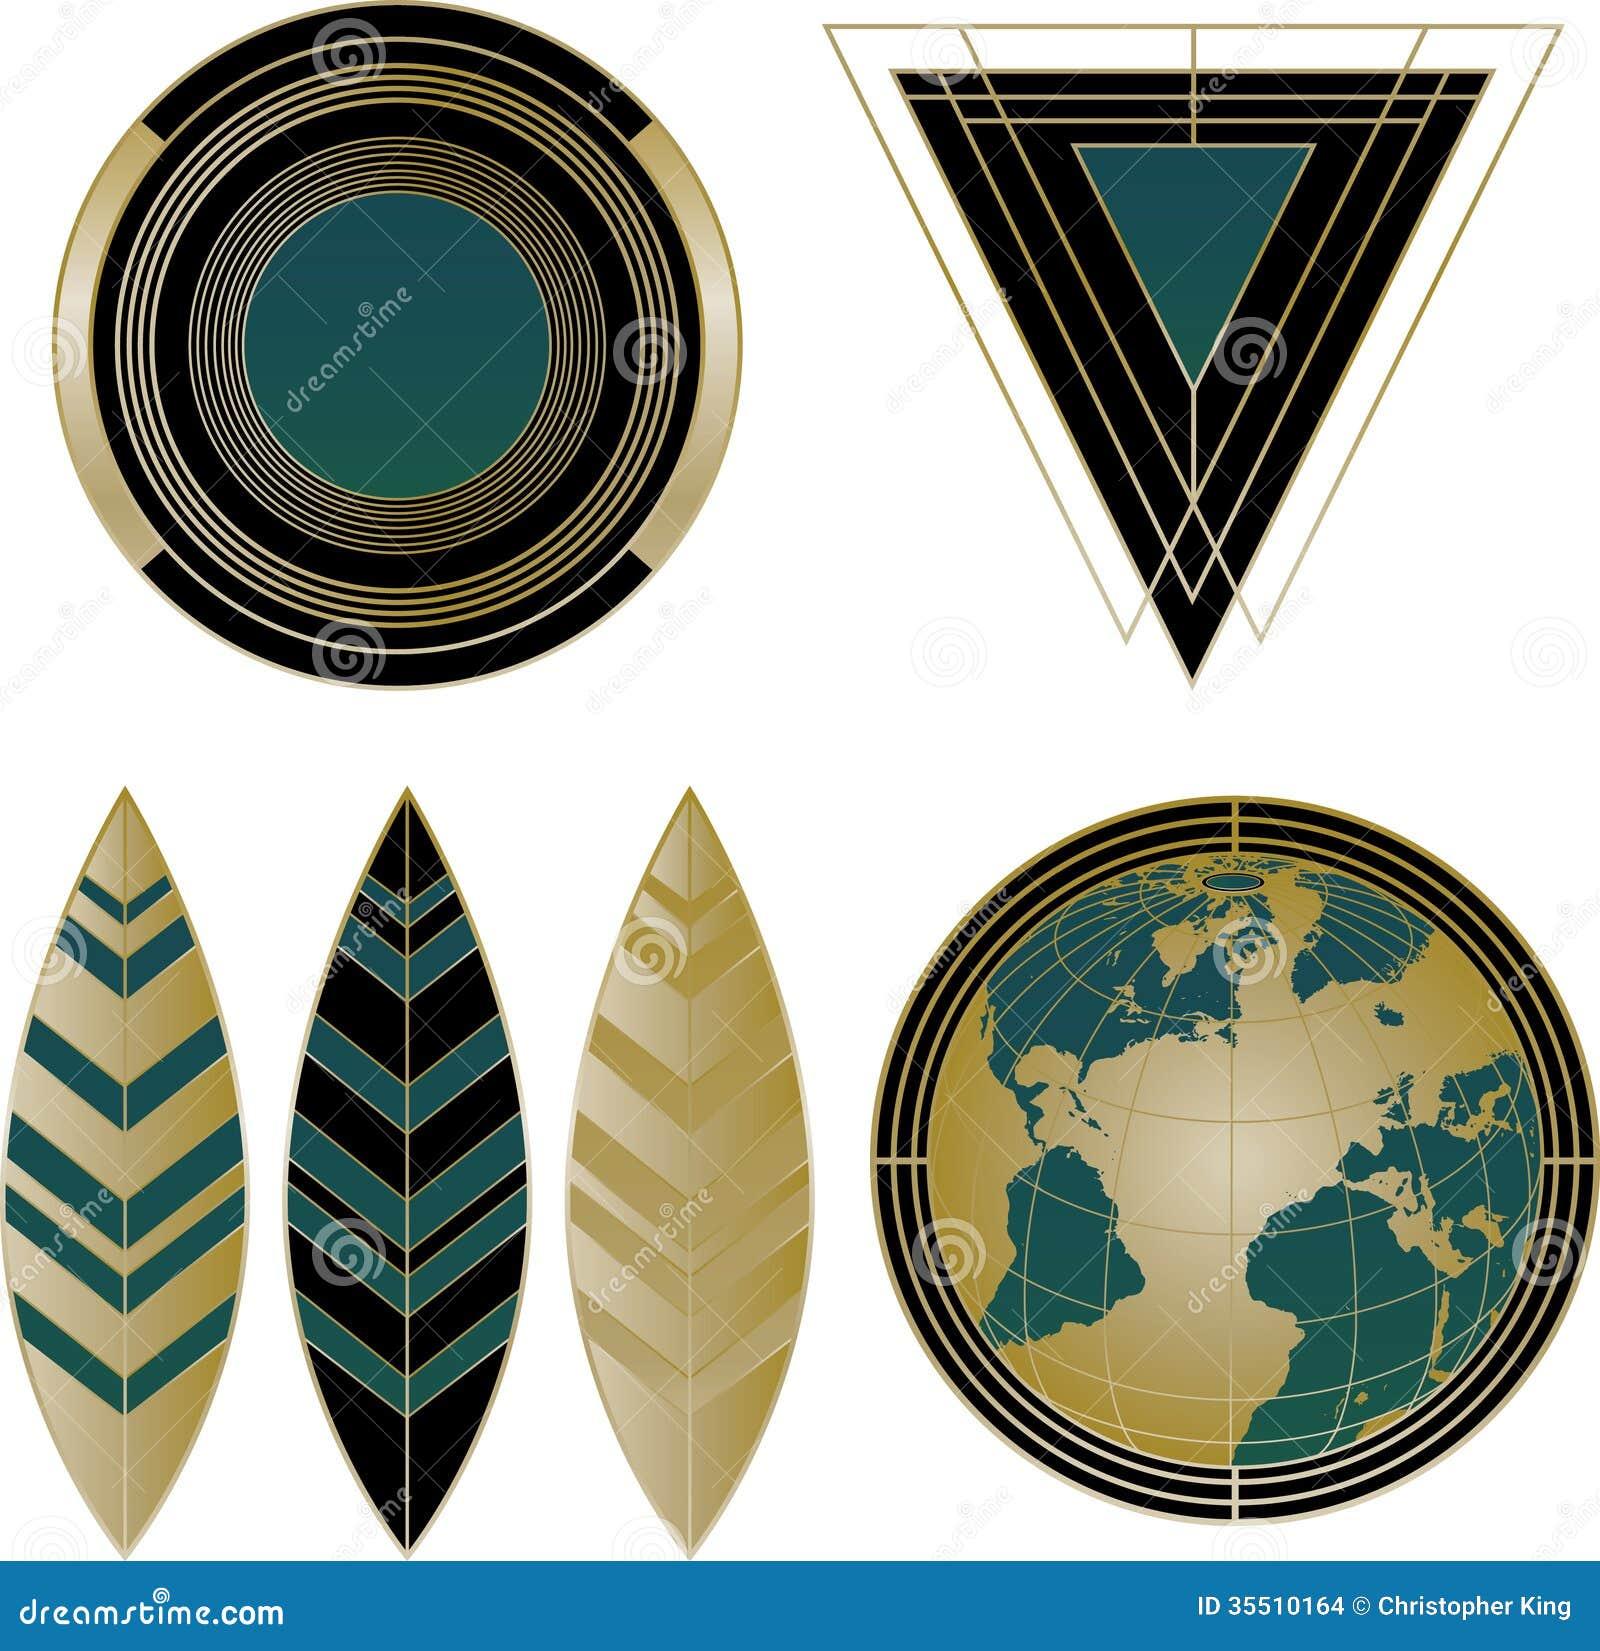 art deco logos and design elements stock images image 35510164. Black Bedroom Furniture Sets. Home Design Ideas